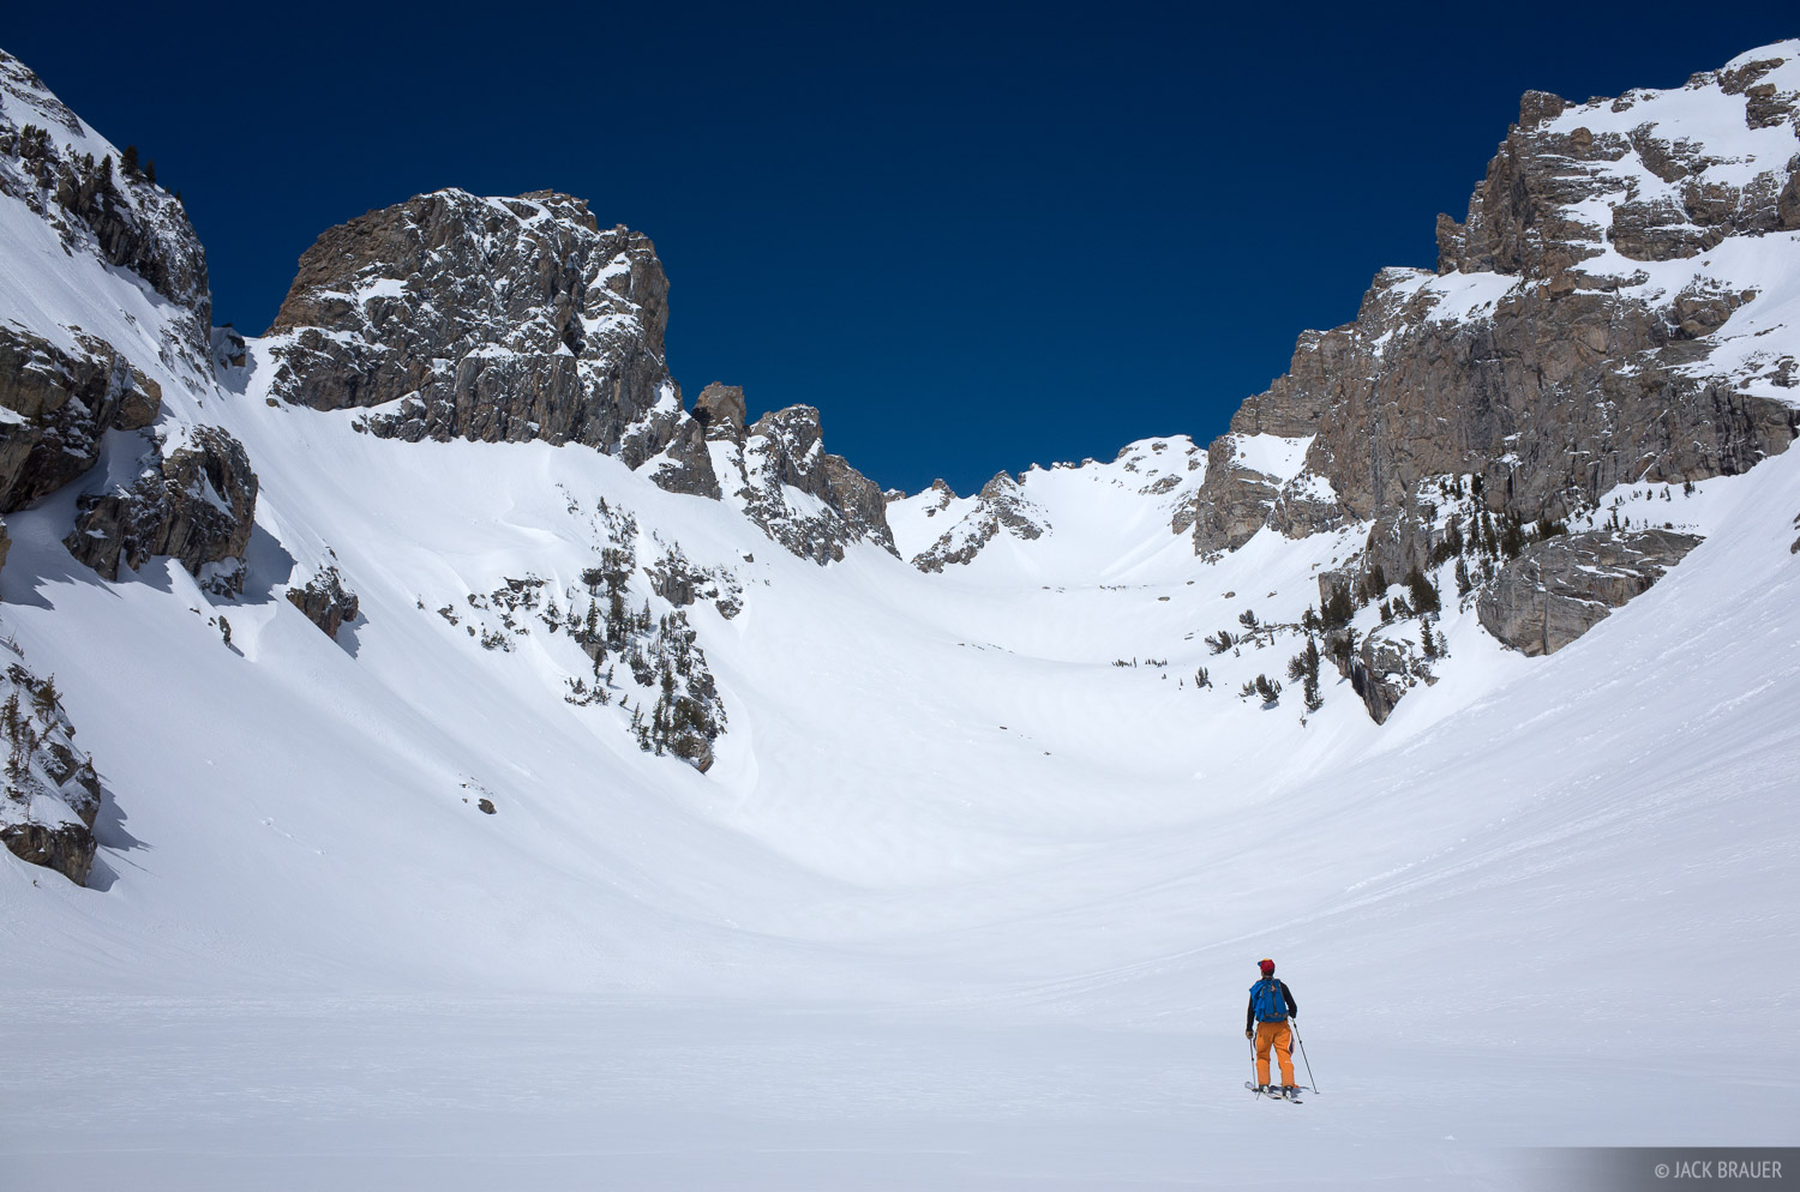 Tetons,The Jaw,Wyoming, skiing, photo